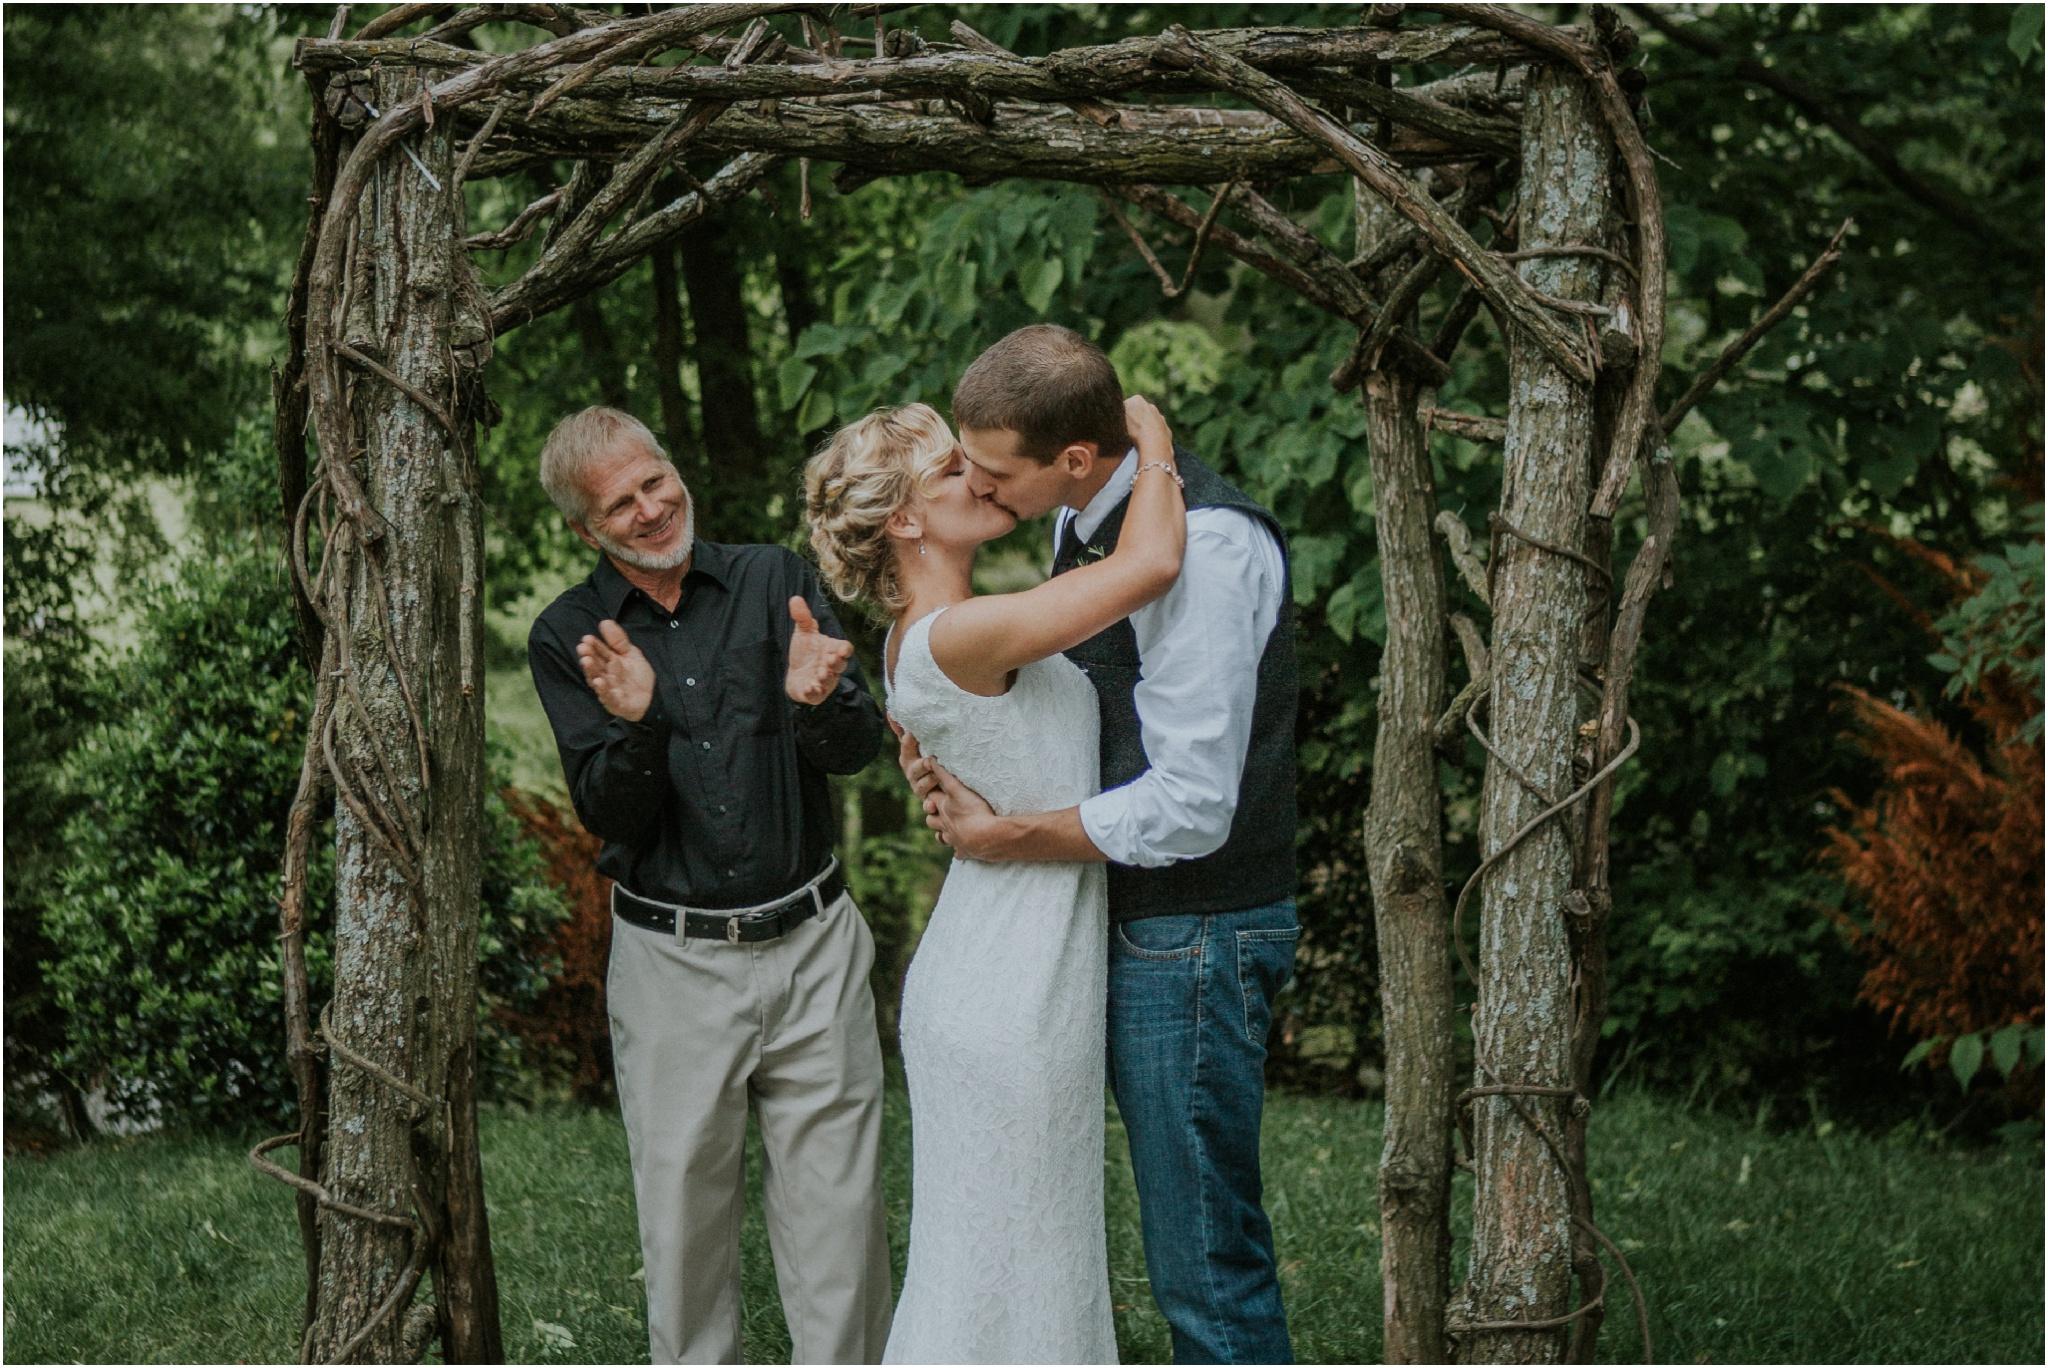 the-millstone-limestone-rustic-intimate-outdoors-backyard-wedding-wildflowers-tennessee_0095.jpg